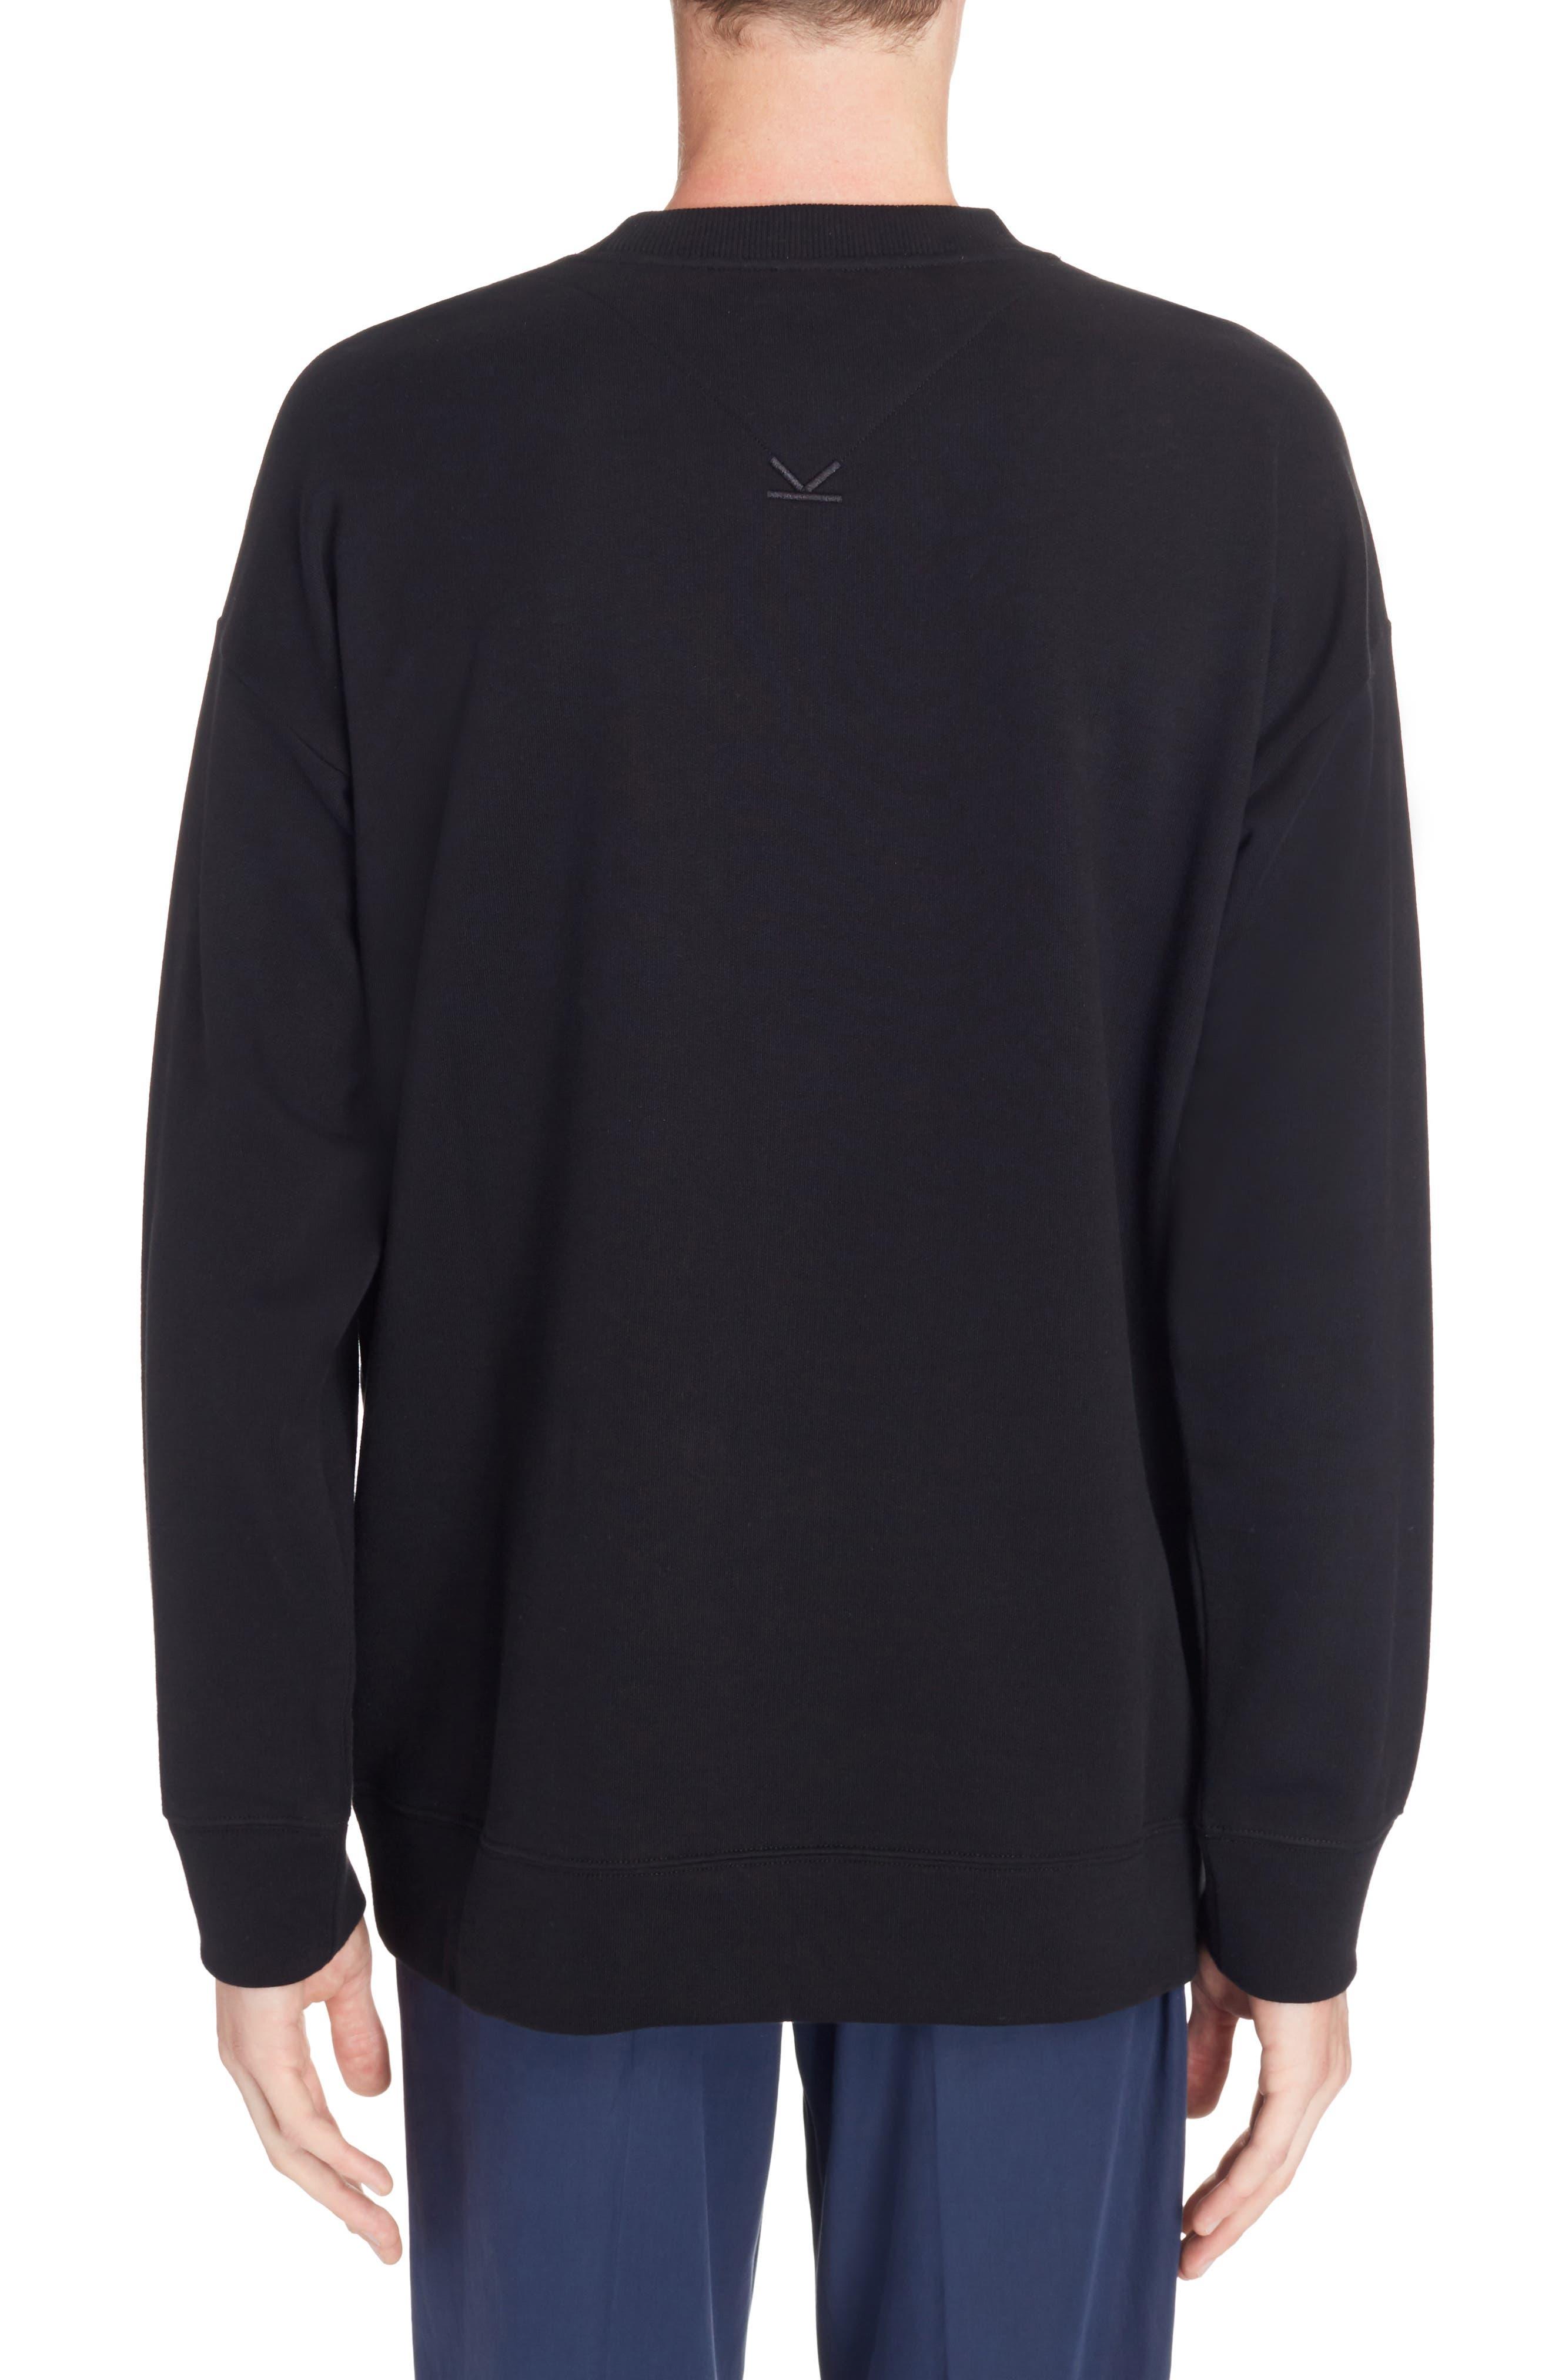 Embroidered Cursive Logo Sweatshirt,                             Alternate thumbnail 2, color,                             001